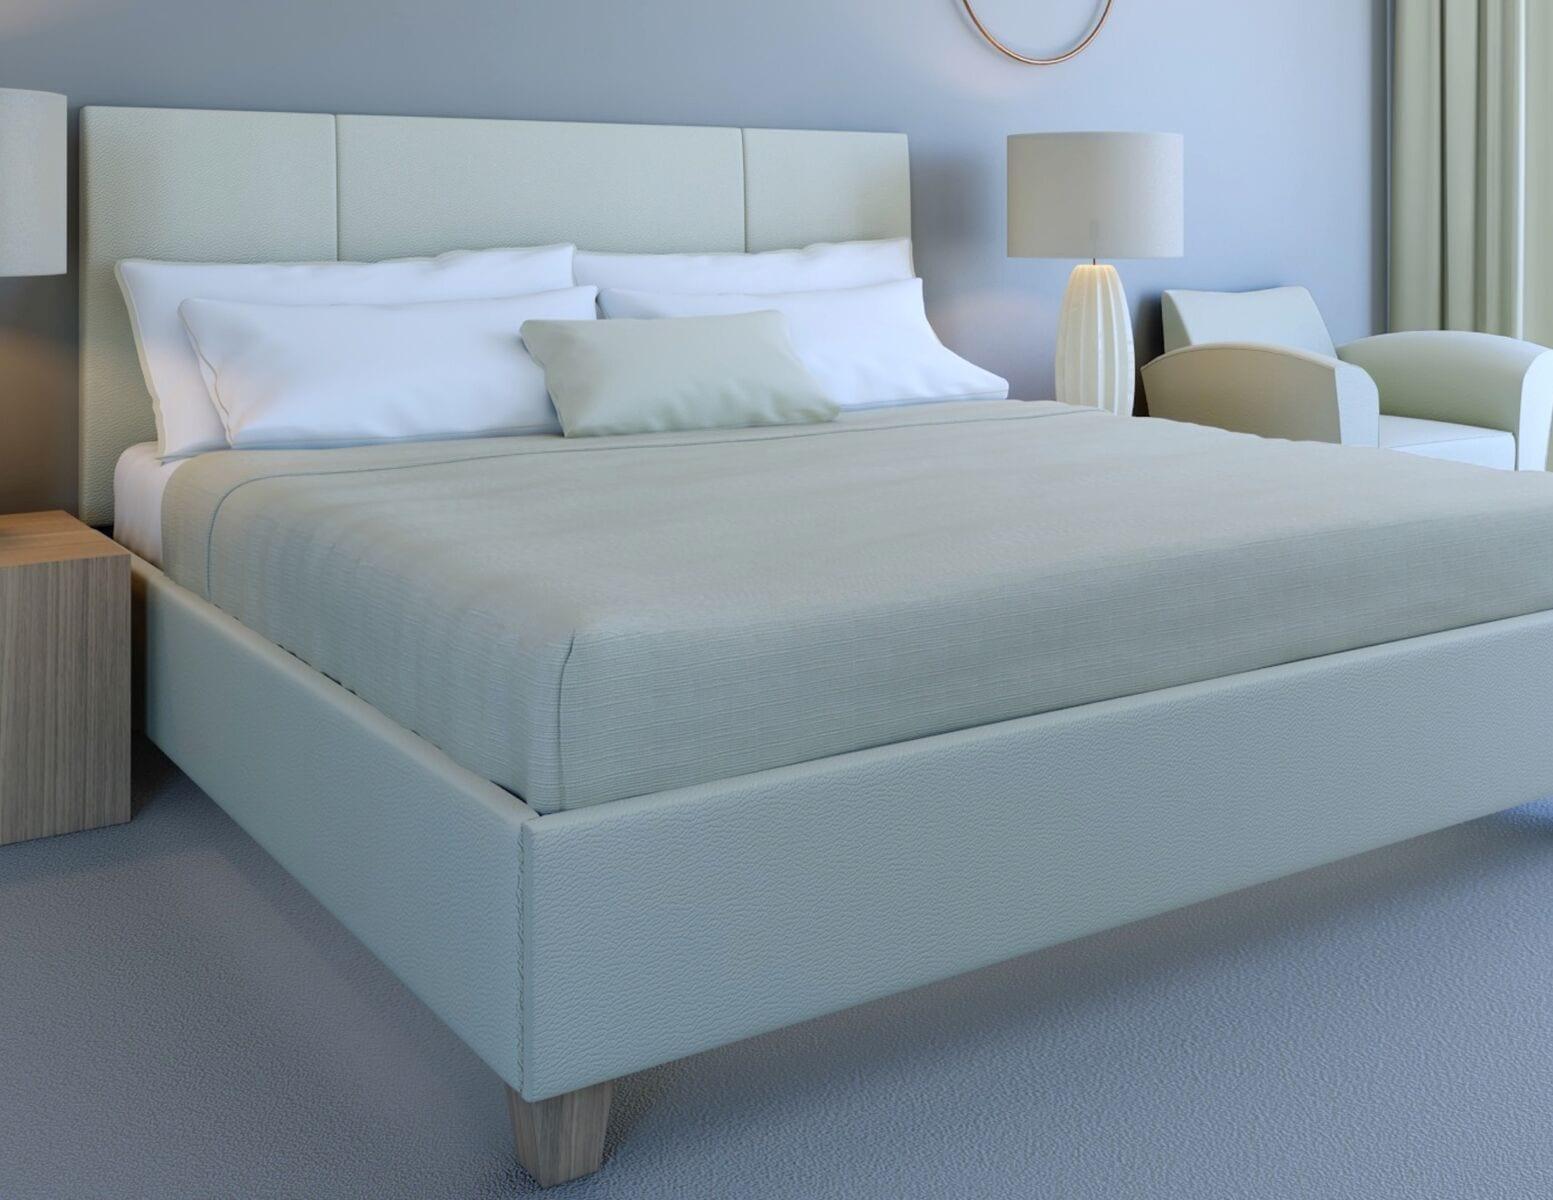 custom bedroom furniture with custom upholstered headboard